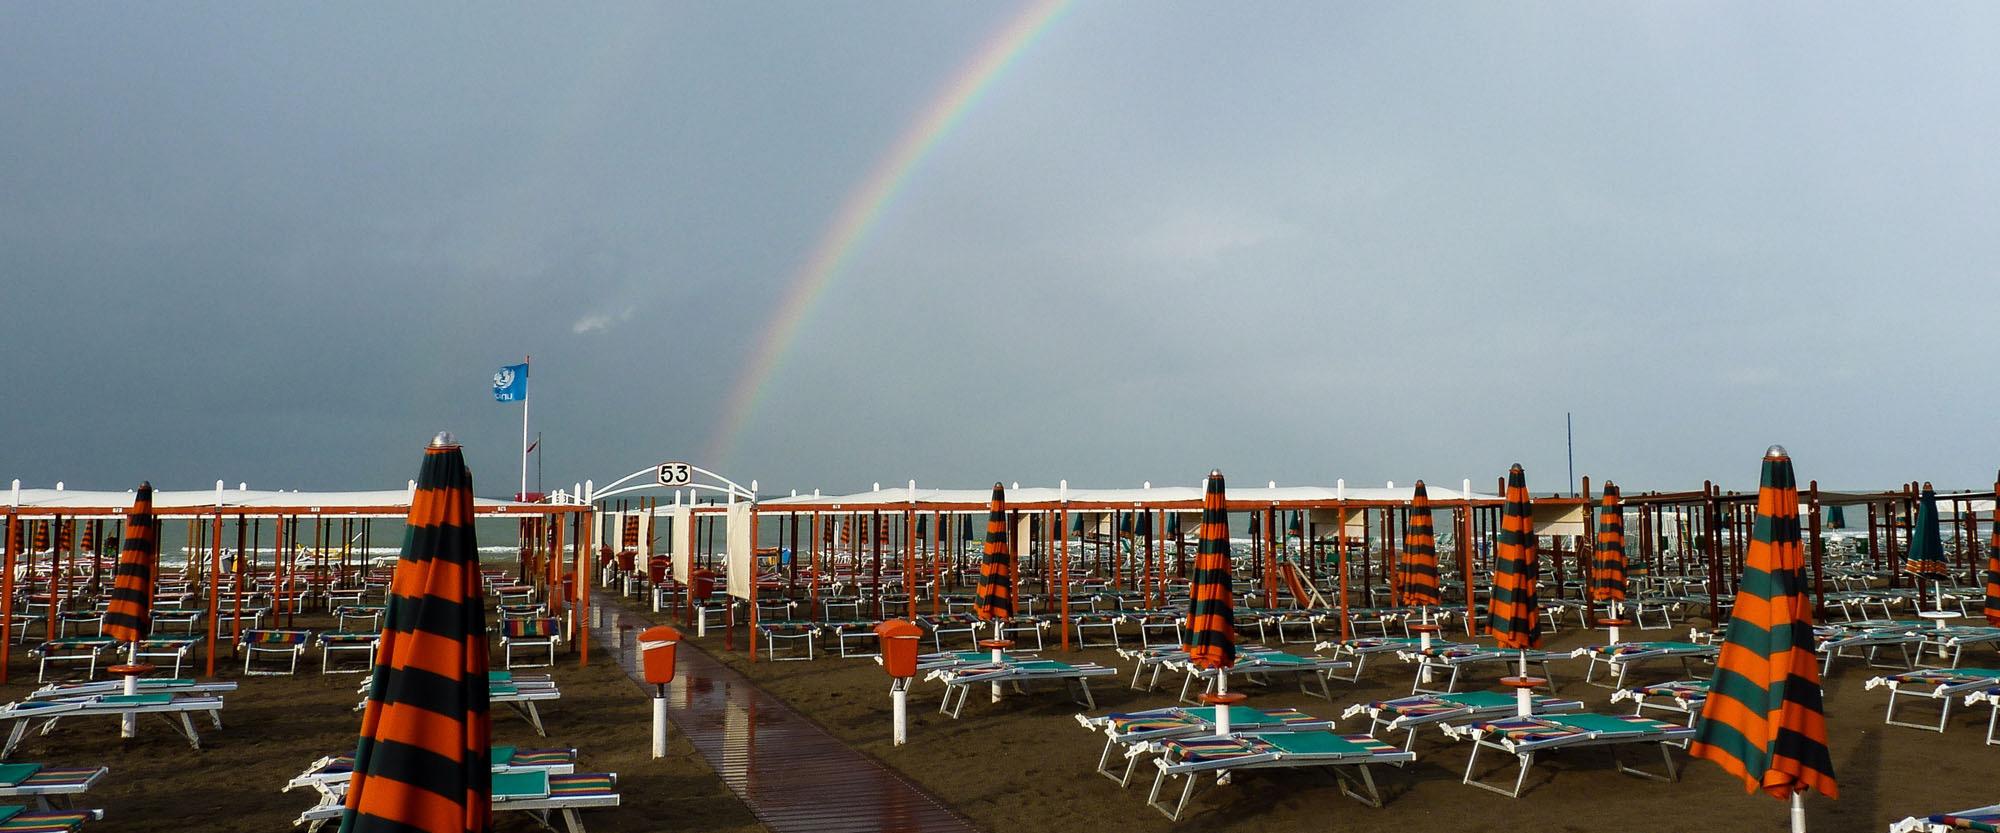 http://www.spiaggia53.it/wp-content/uploads/2017/02/slider-arcobaleno-1.jpg